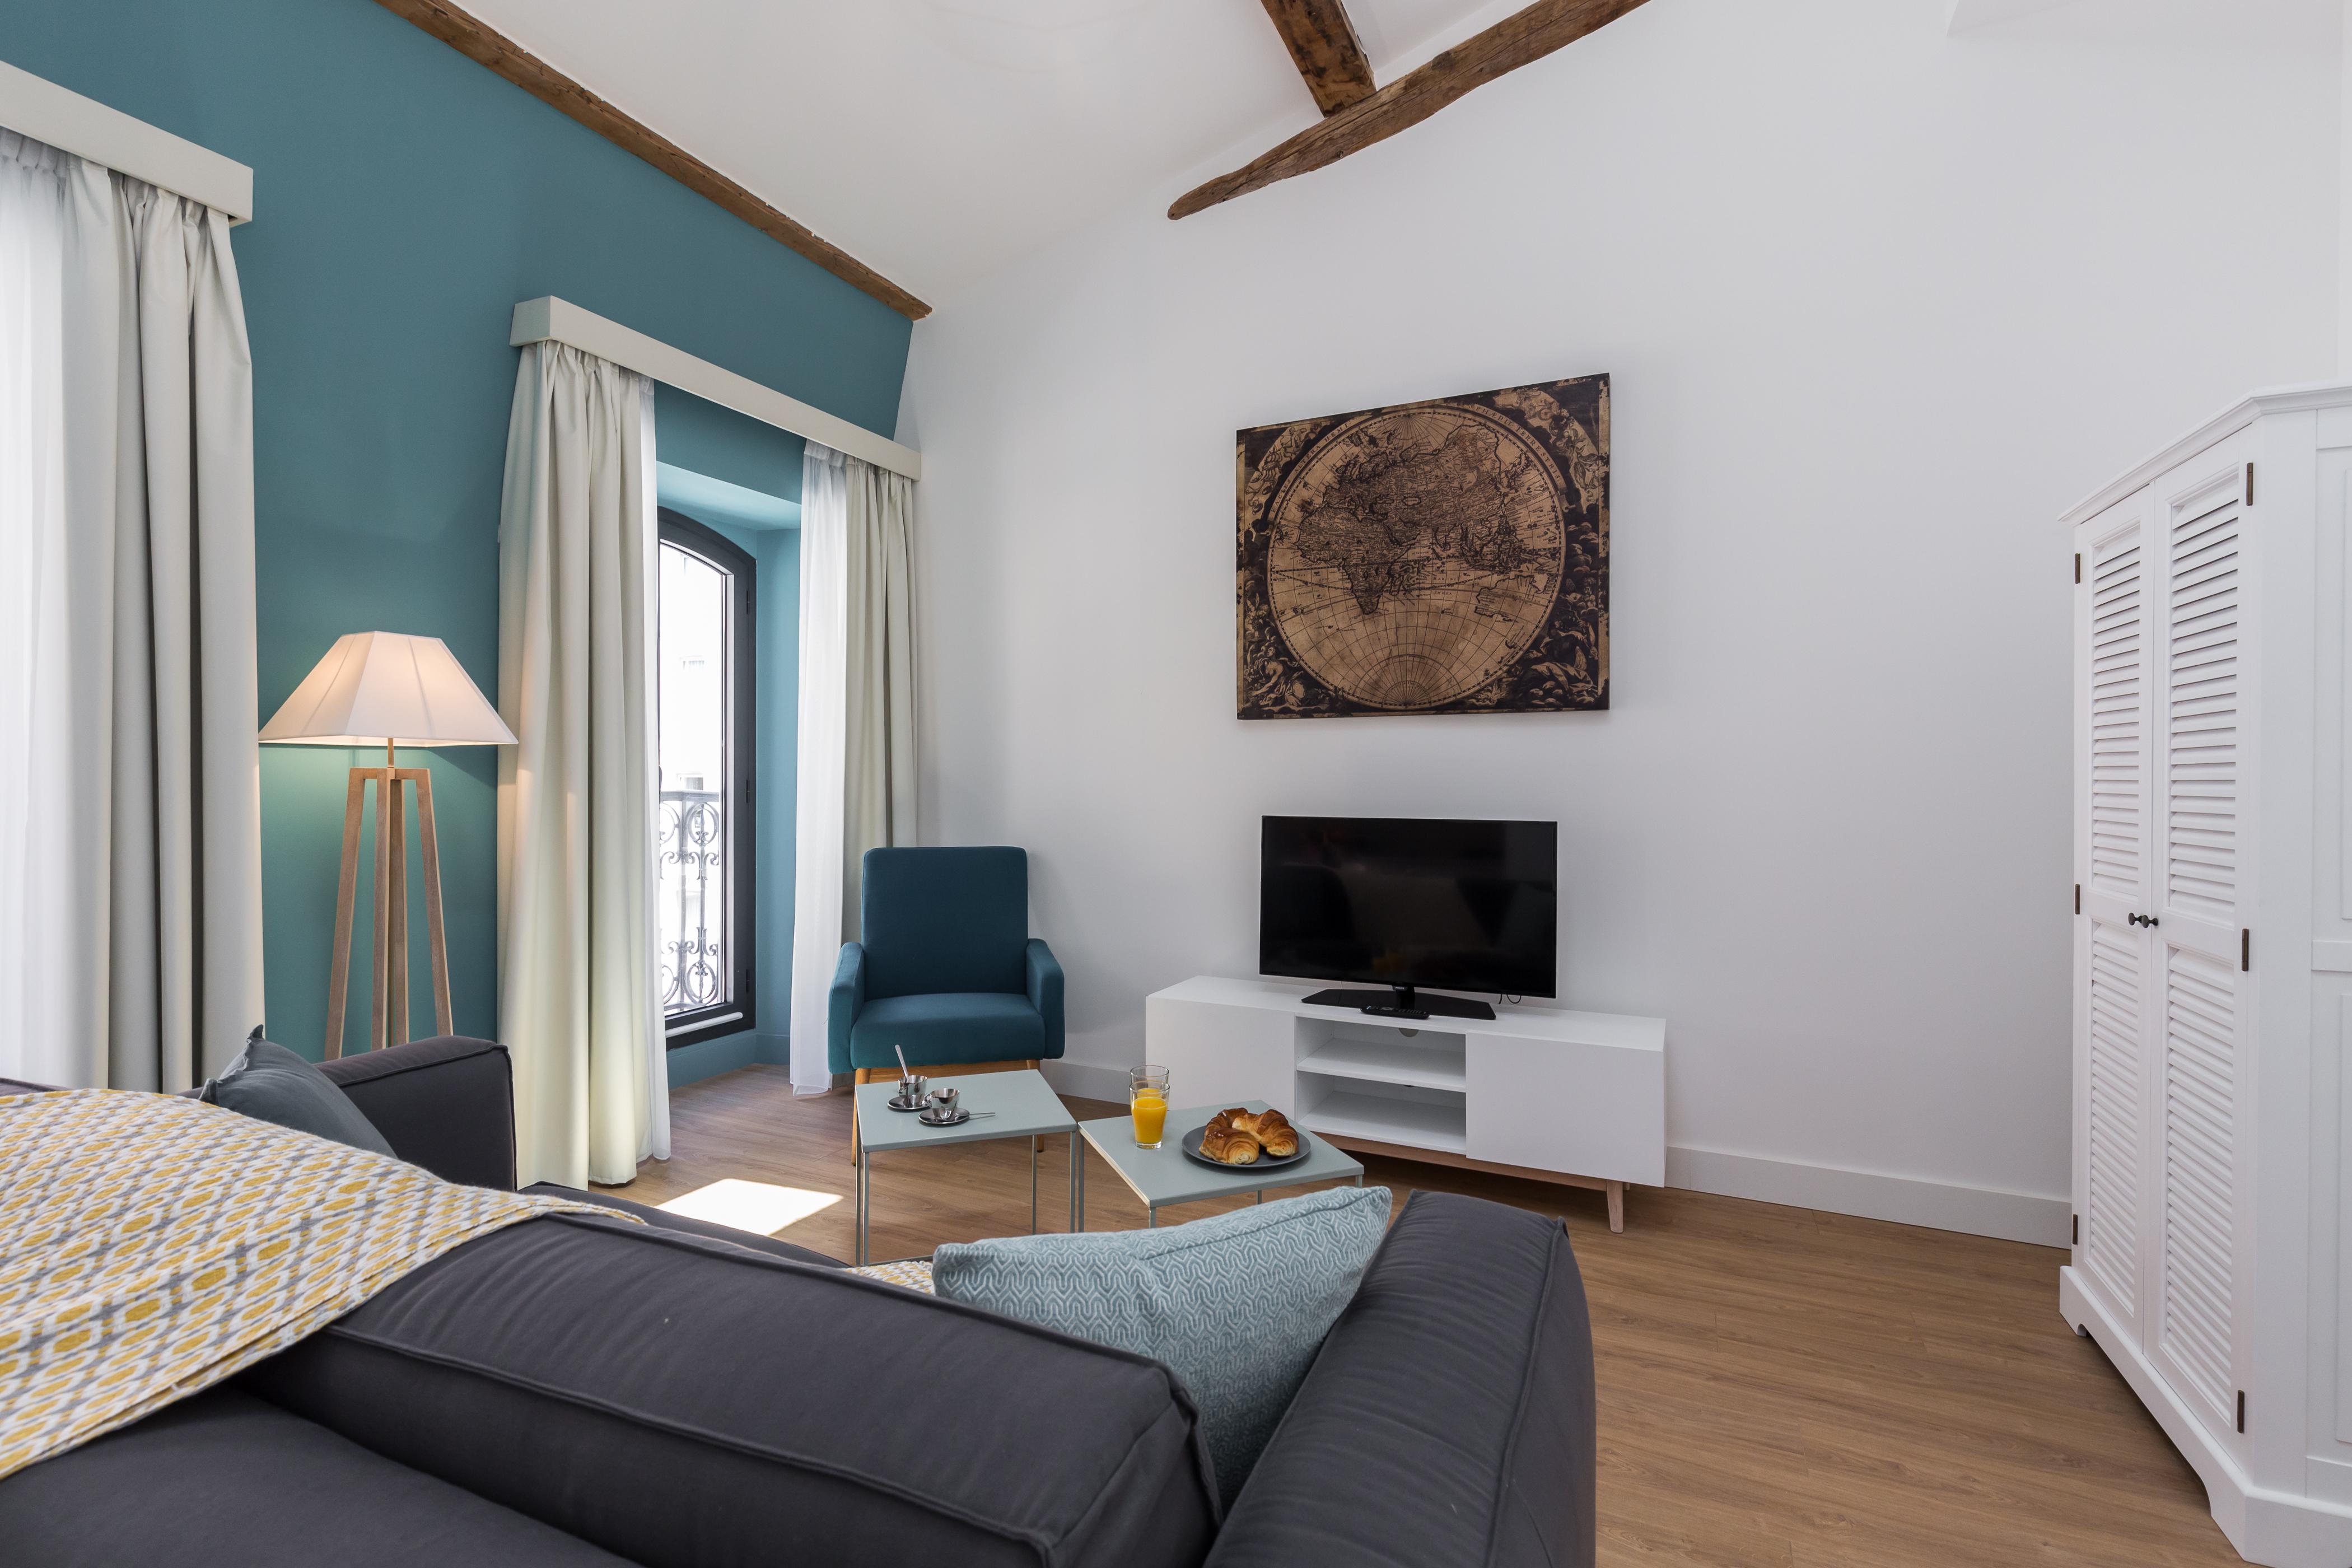 2 pièces 43 m² - 1 bedroom 43 sqm